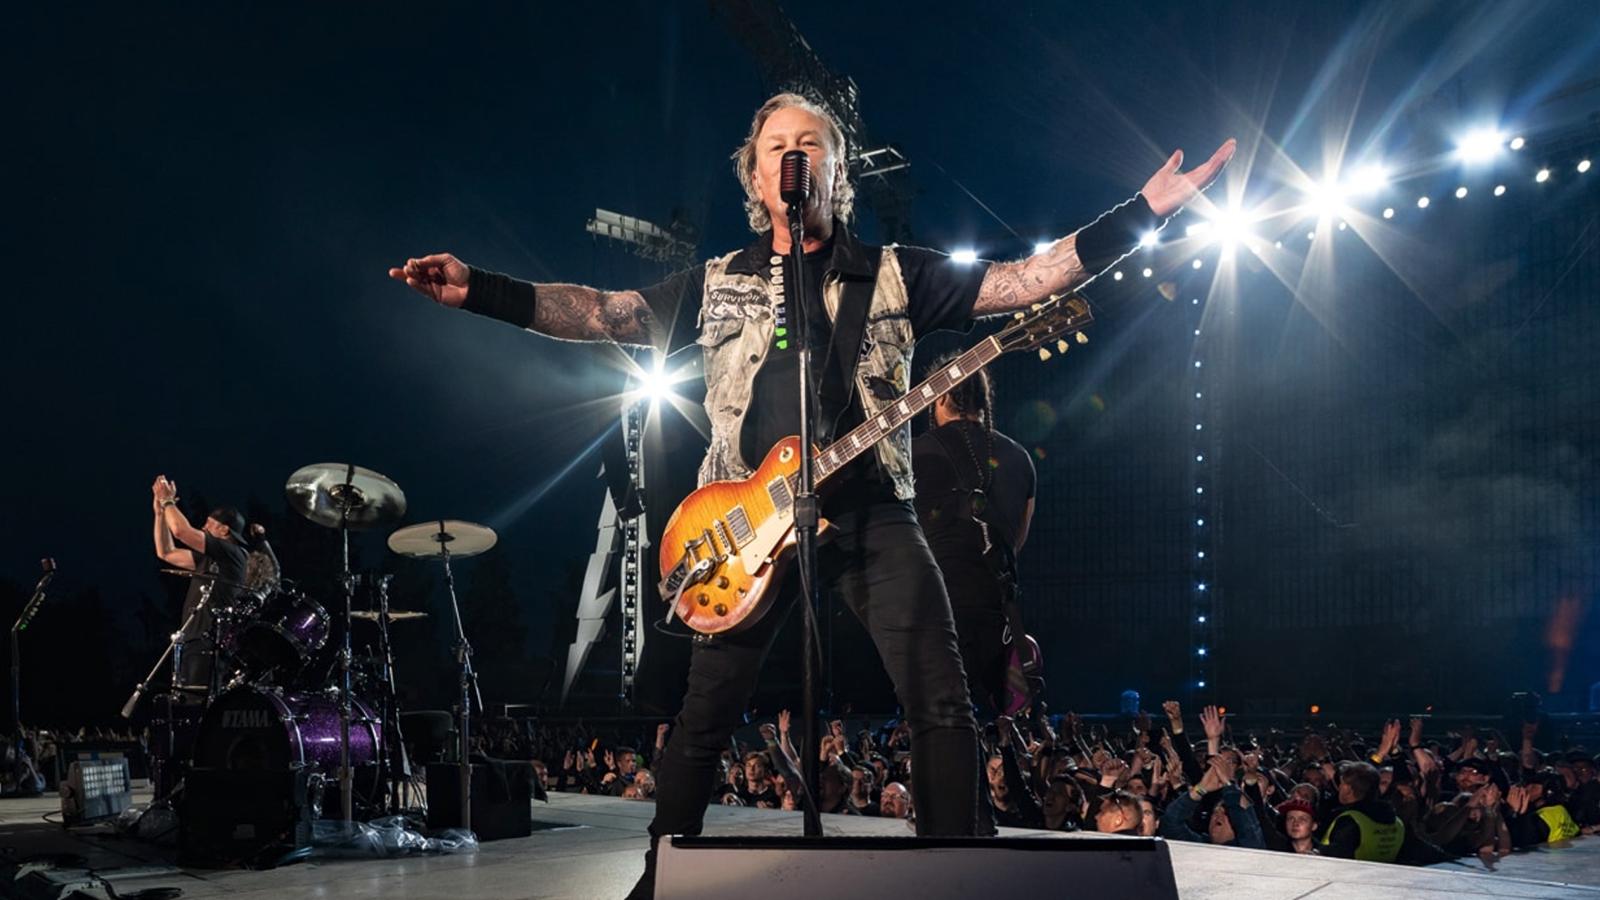 See Metallica's Full Finland WorldWired Set in Stunning Pro-Shot Video